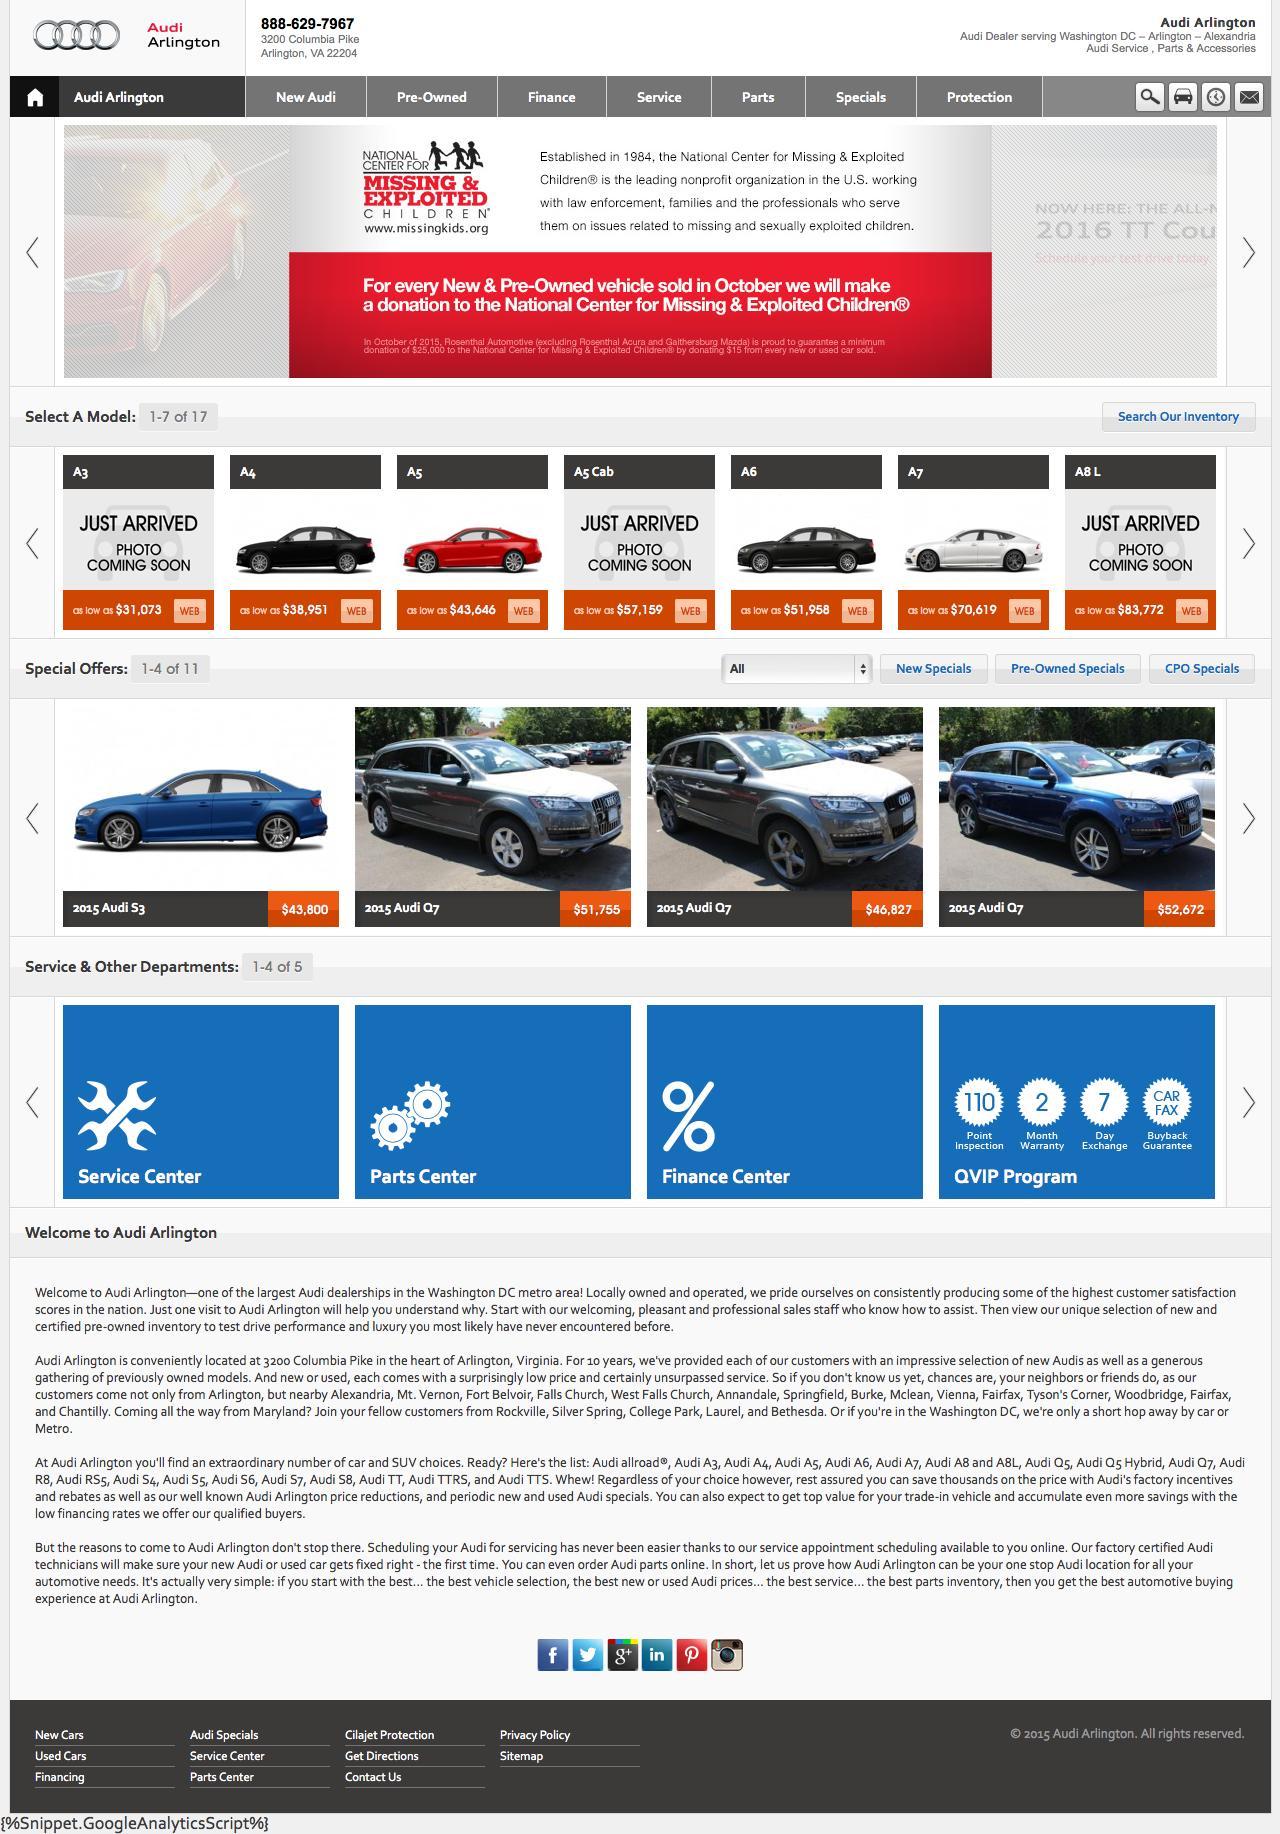 Web Design Example A Page On Audiofarlingtoncom Crayon - Audi arlington